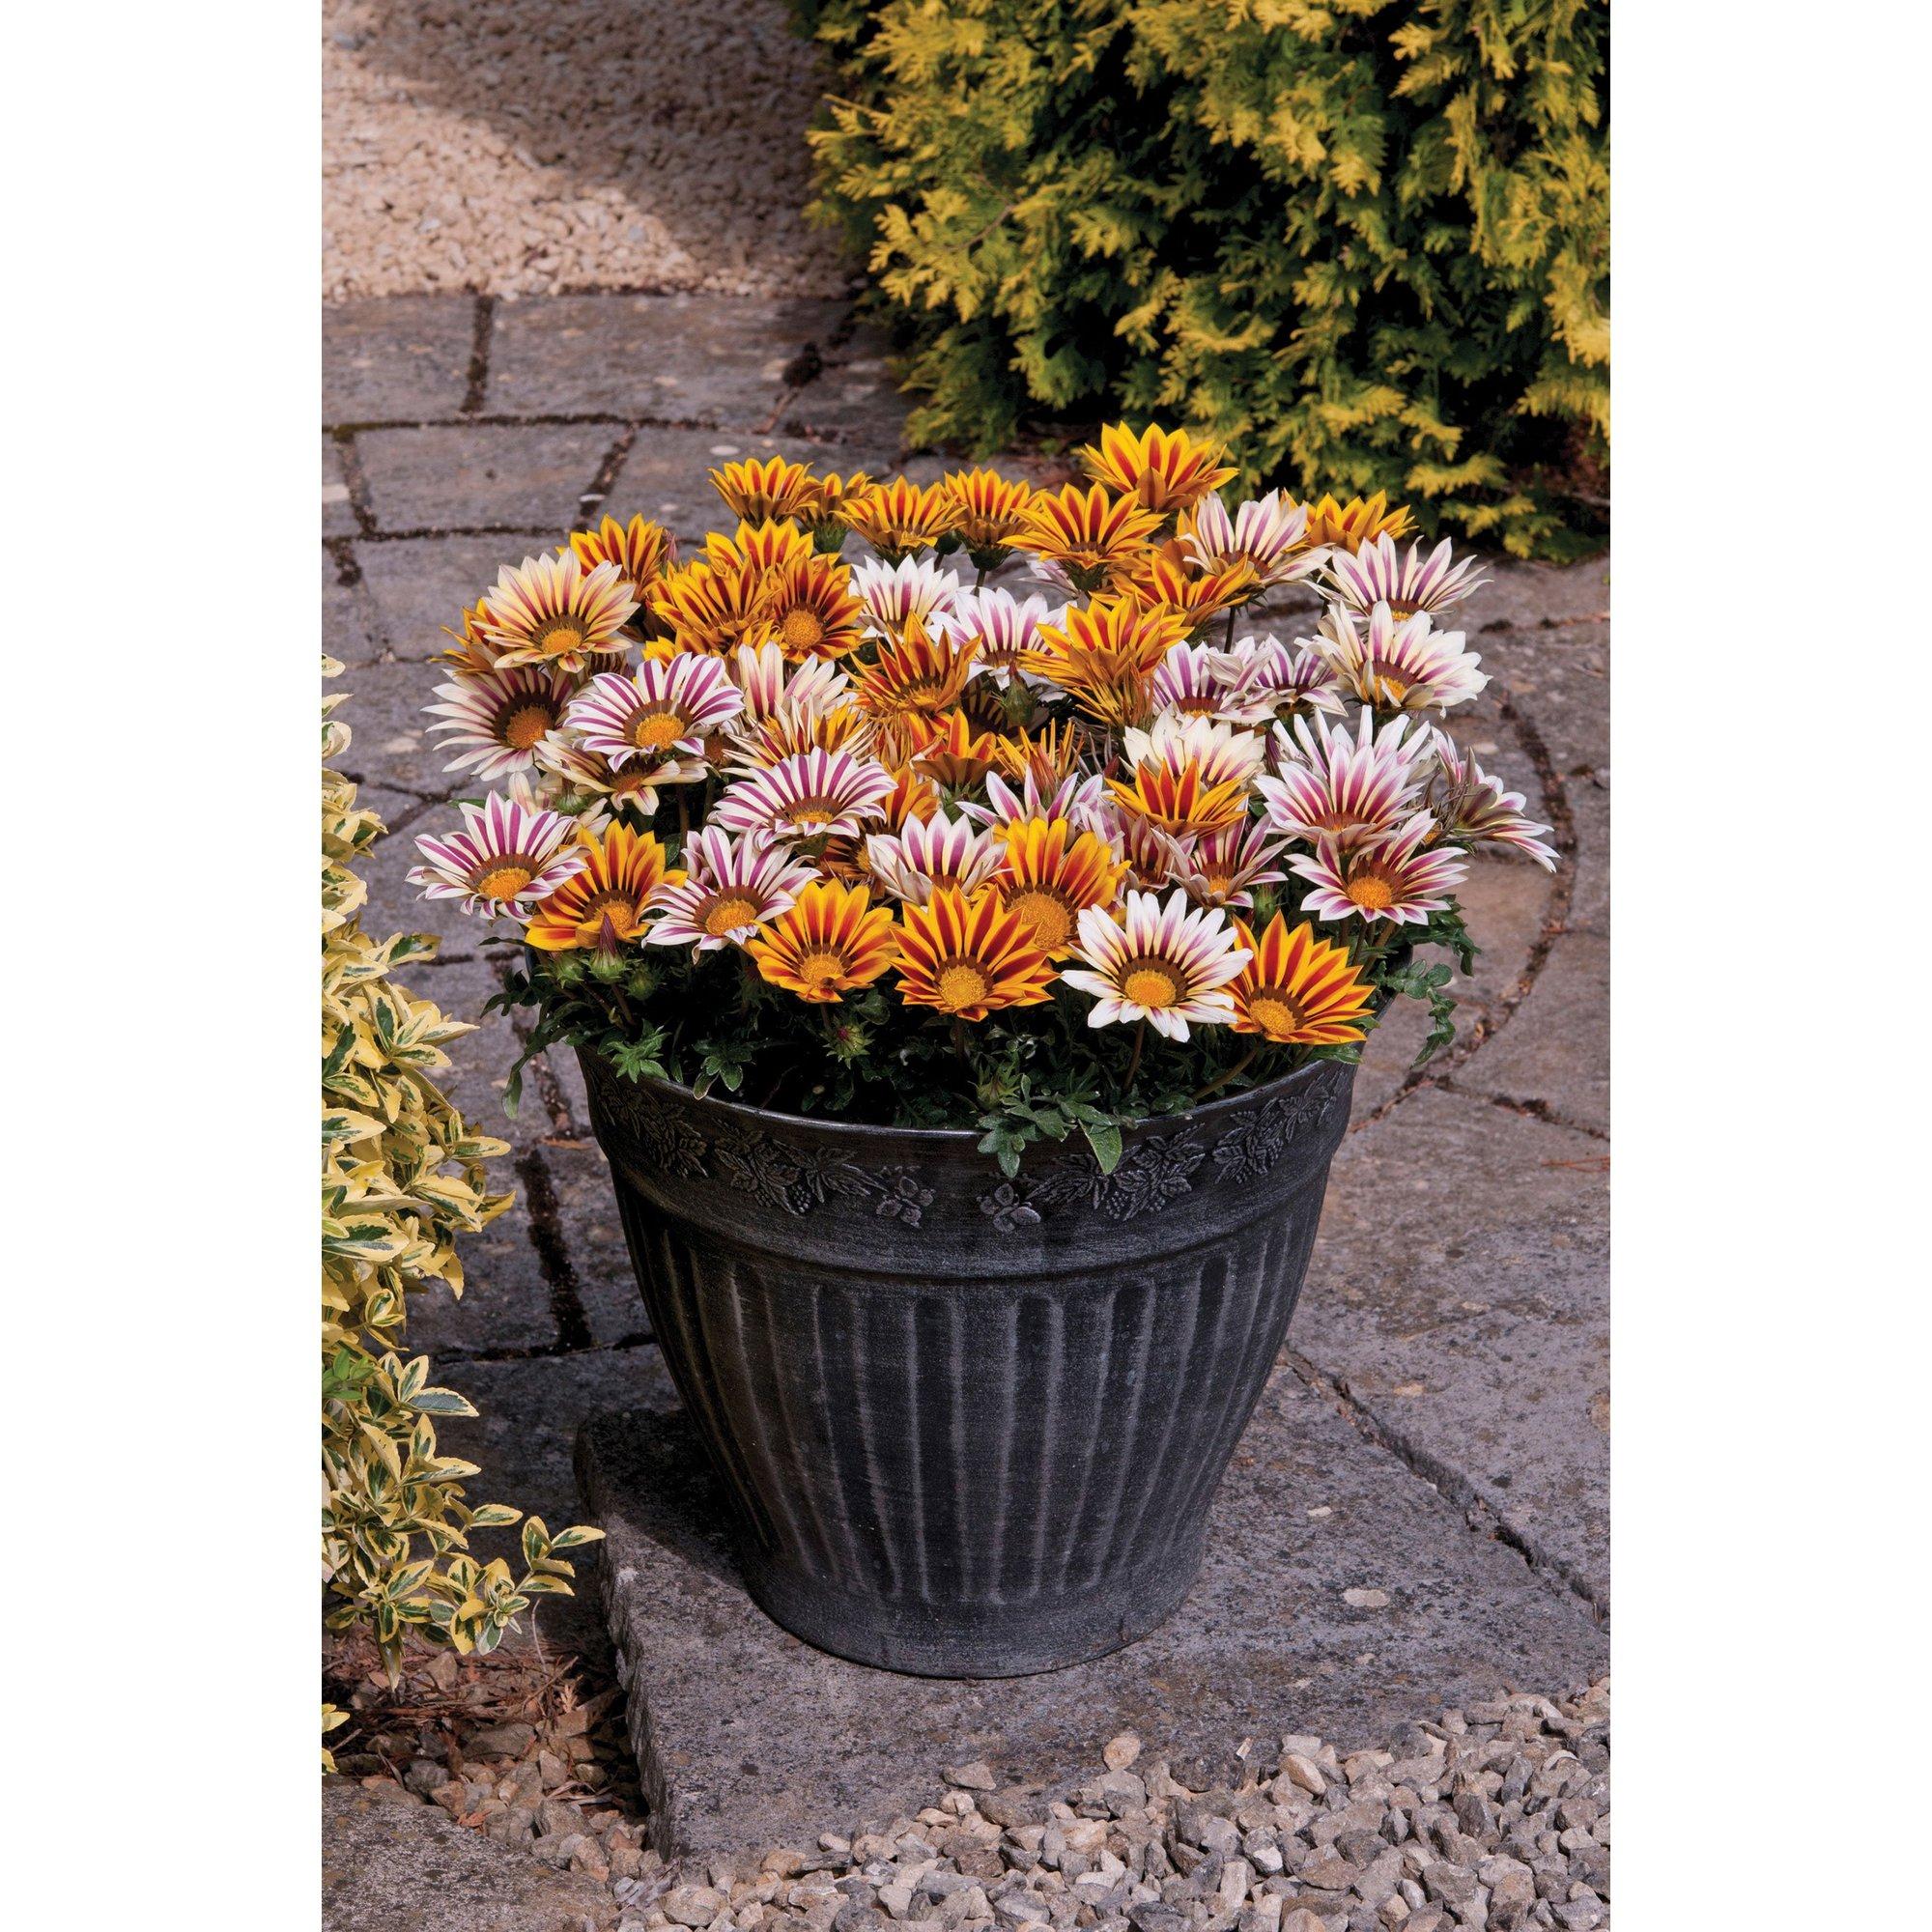 Image of 20 Gazania Tiger Stripes Mixed Garden Ready Plants